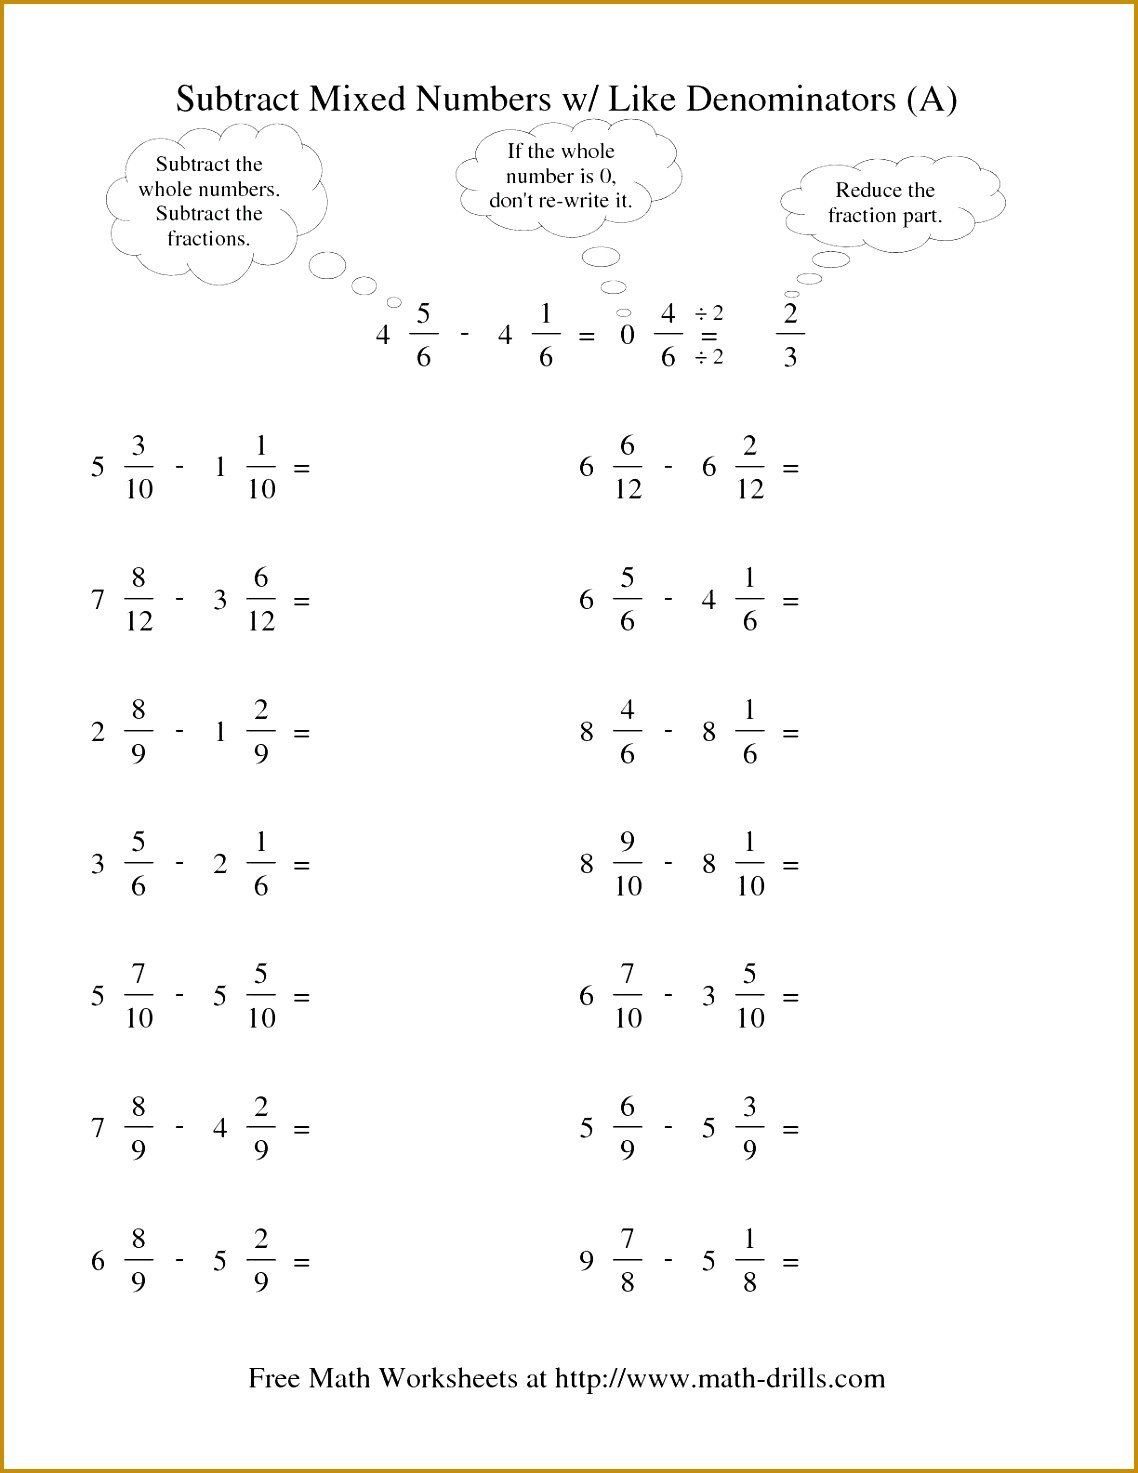 Decomposing Mixed Numbers Worksheet Reducing Improper Fractions Worksheet In 2020 Fractions Worksheets Mixed Numbers Adding Mixed Number